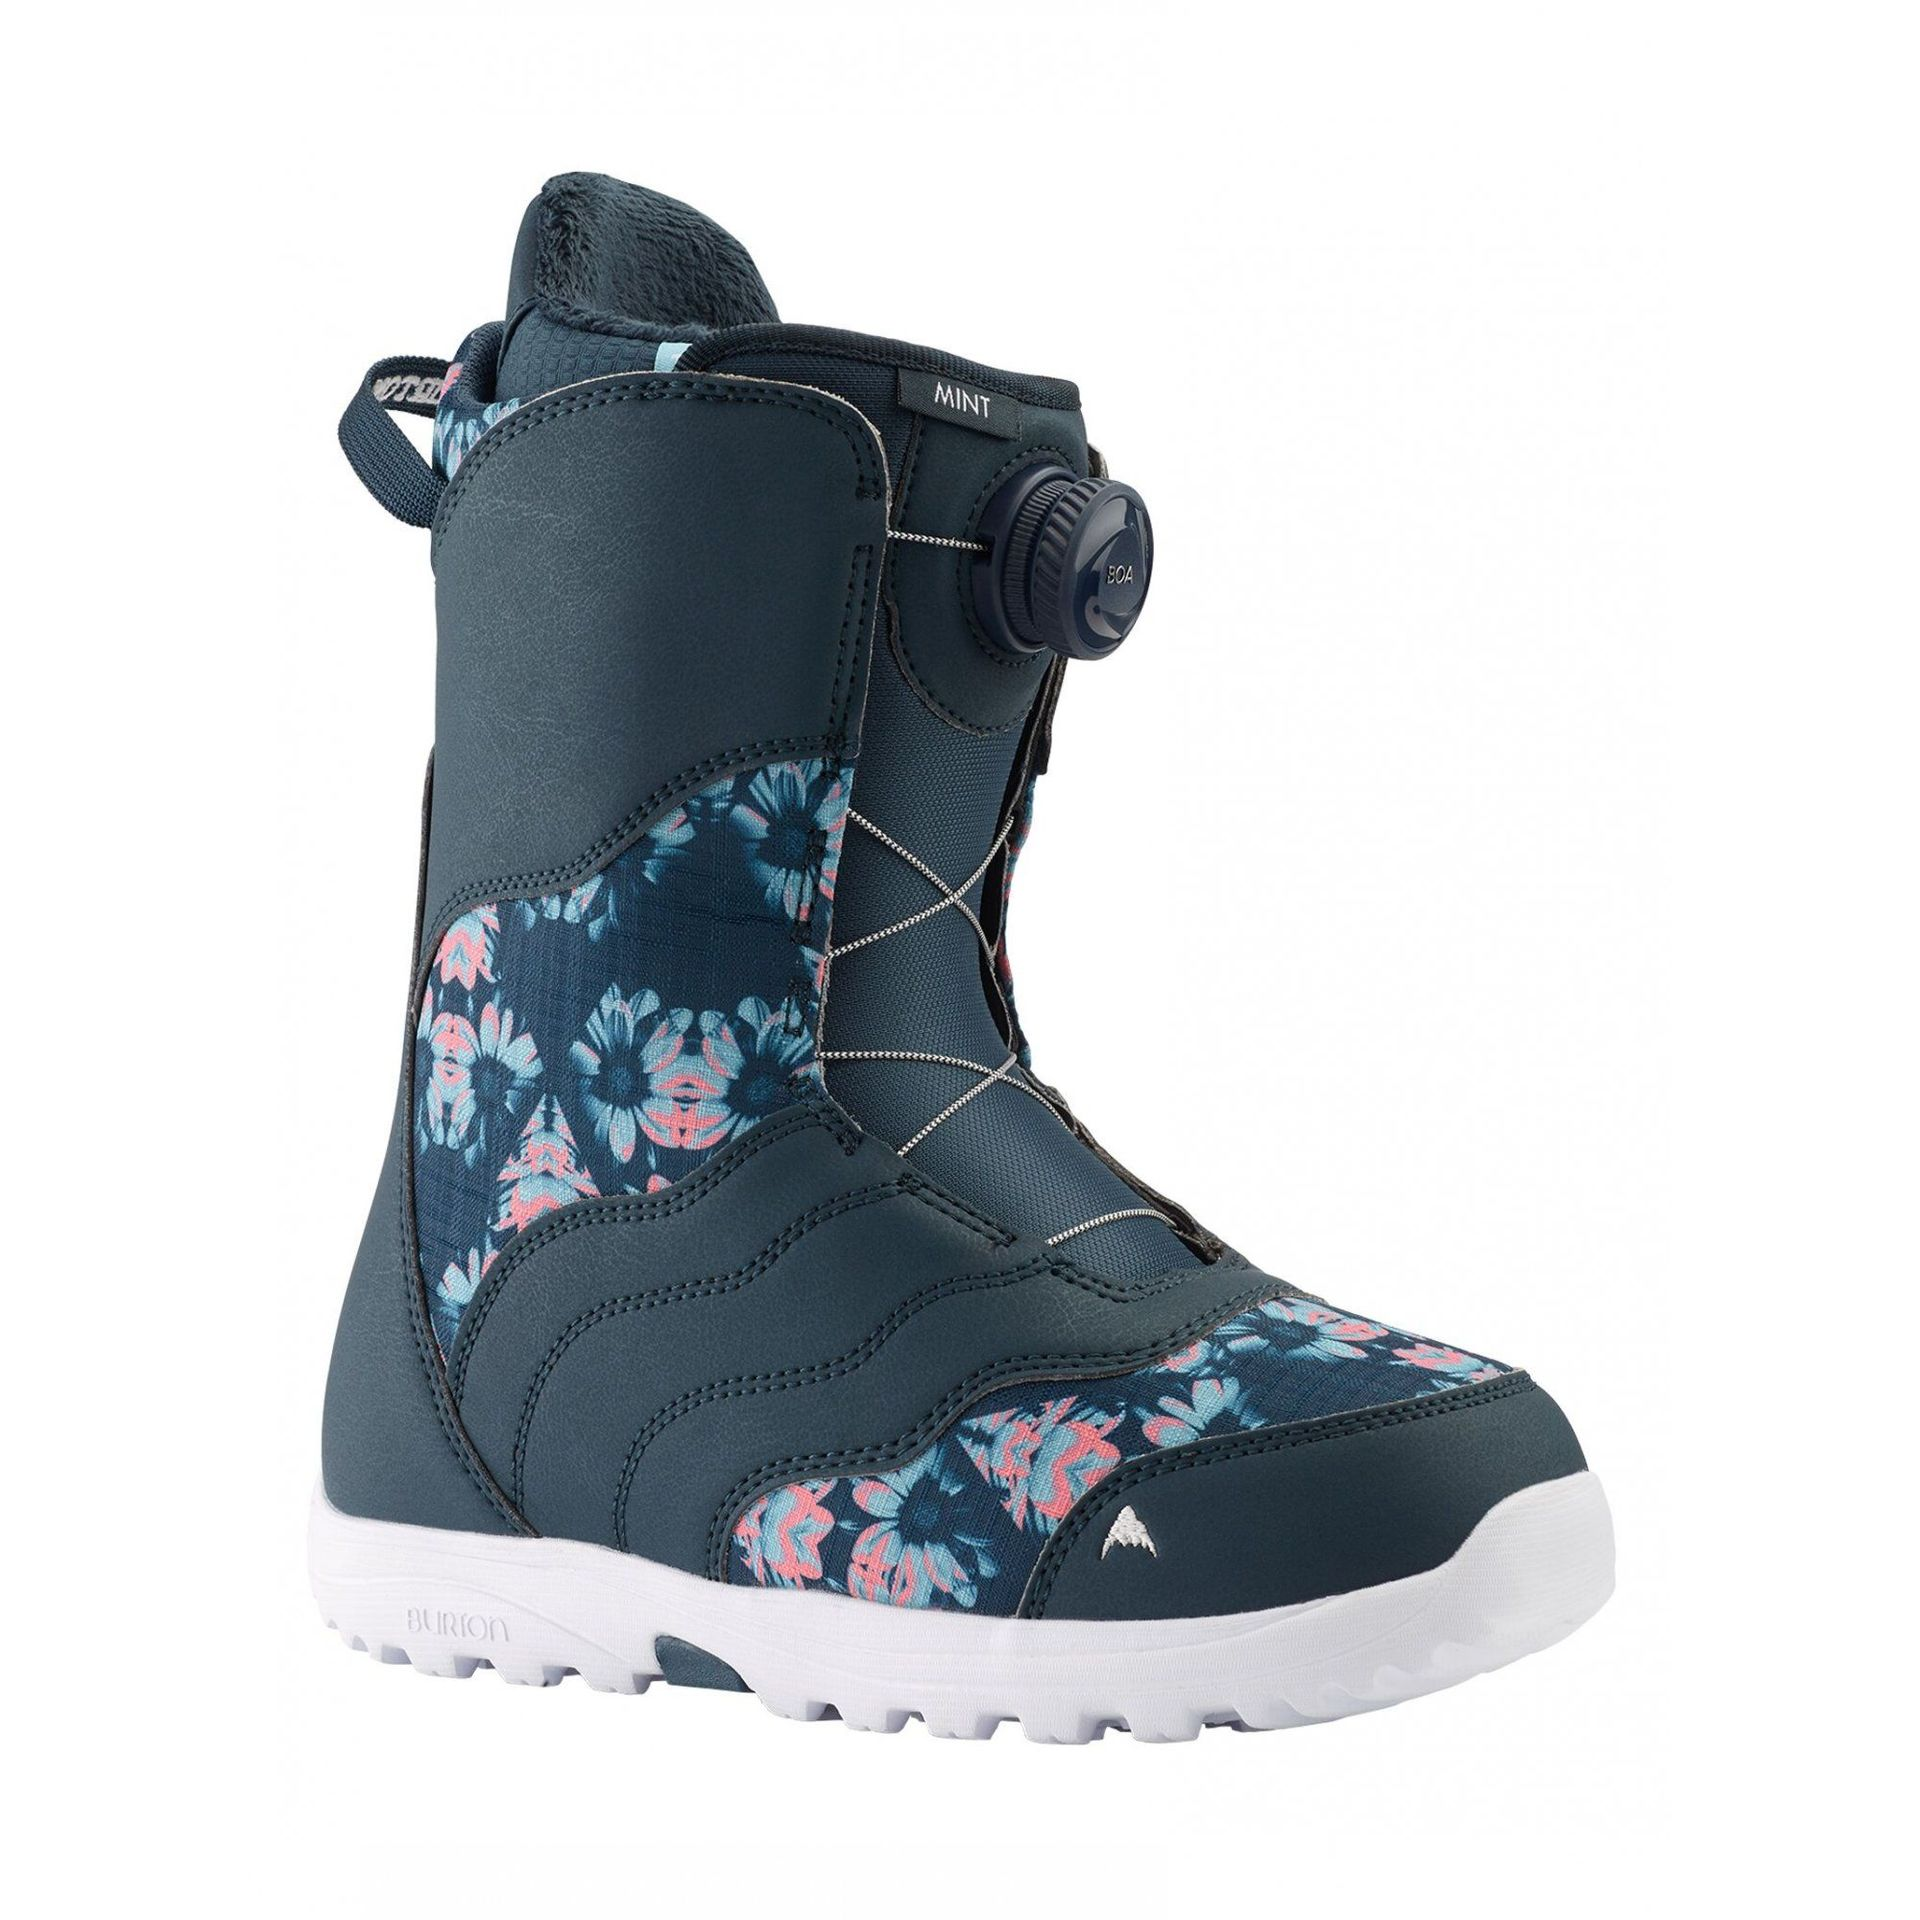 BUTY SNOWBOARDOWE BURTON MINT BOA MIDNITE BLUE|MULTI 131771-423 1